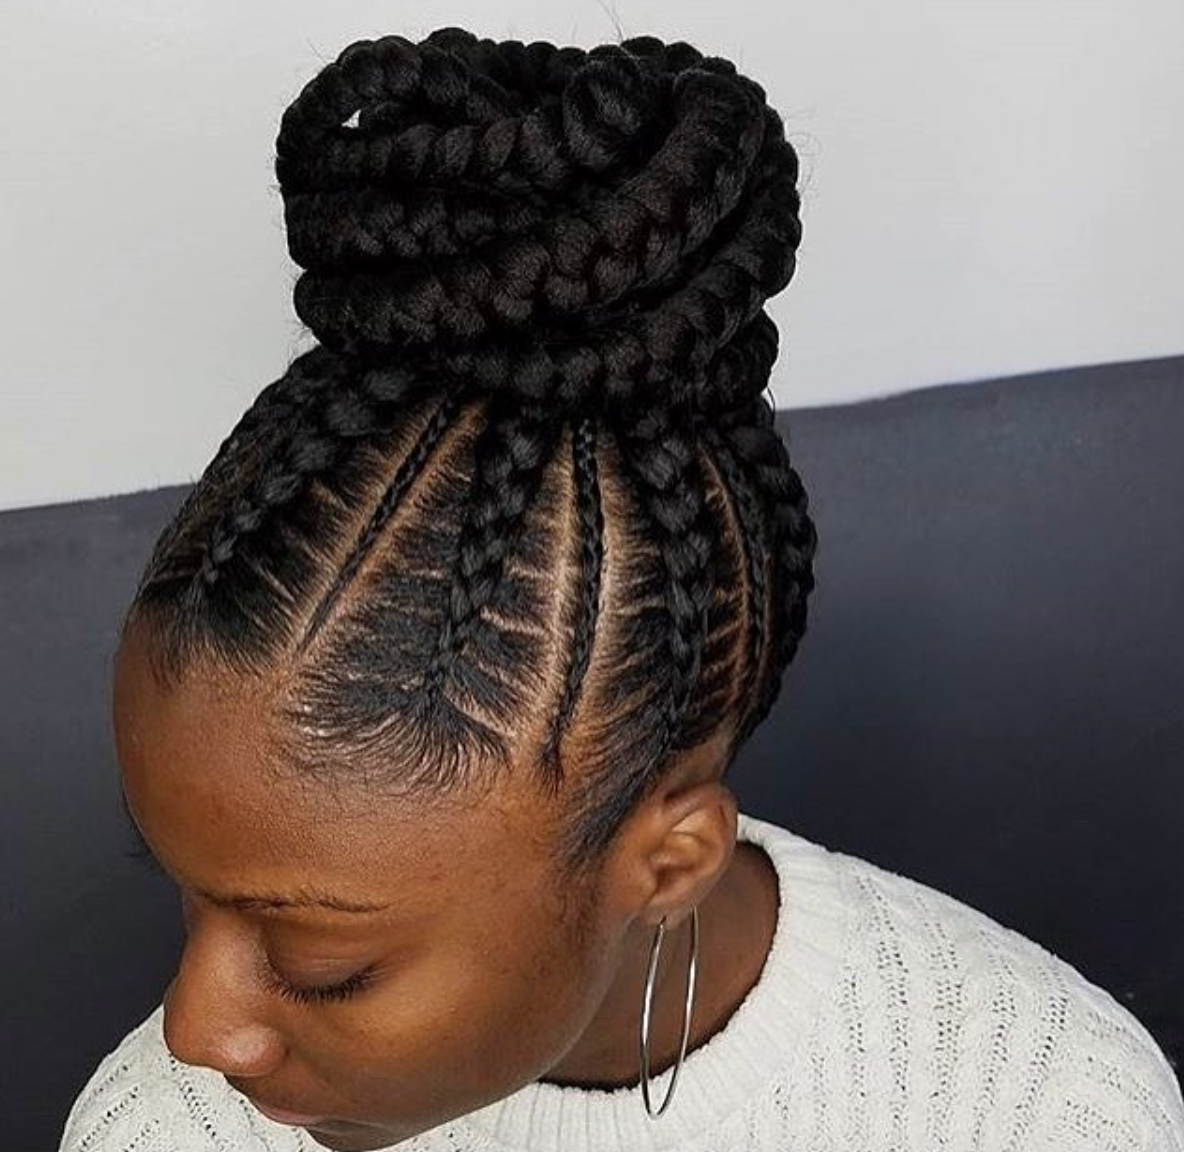 flawless braided bun by @narahairbraiding - http